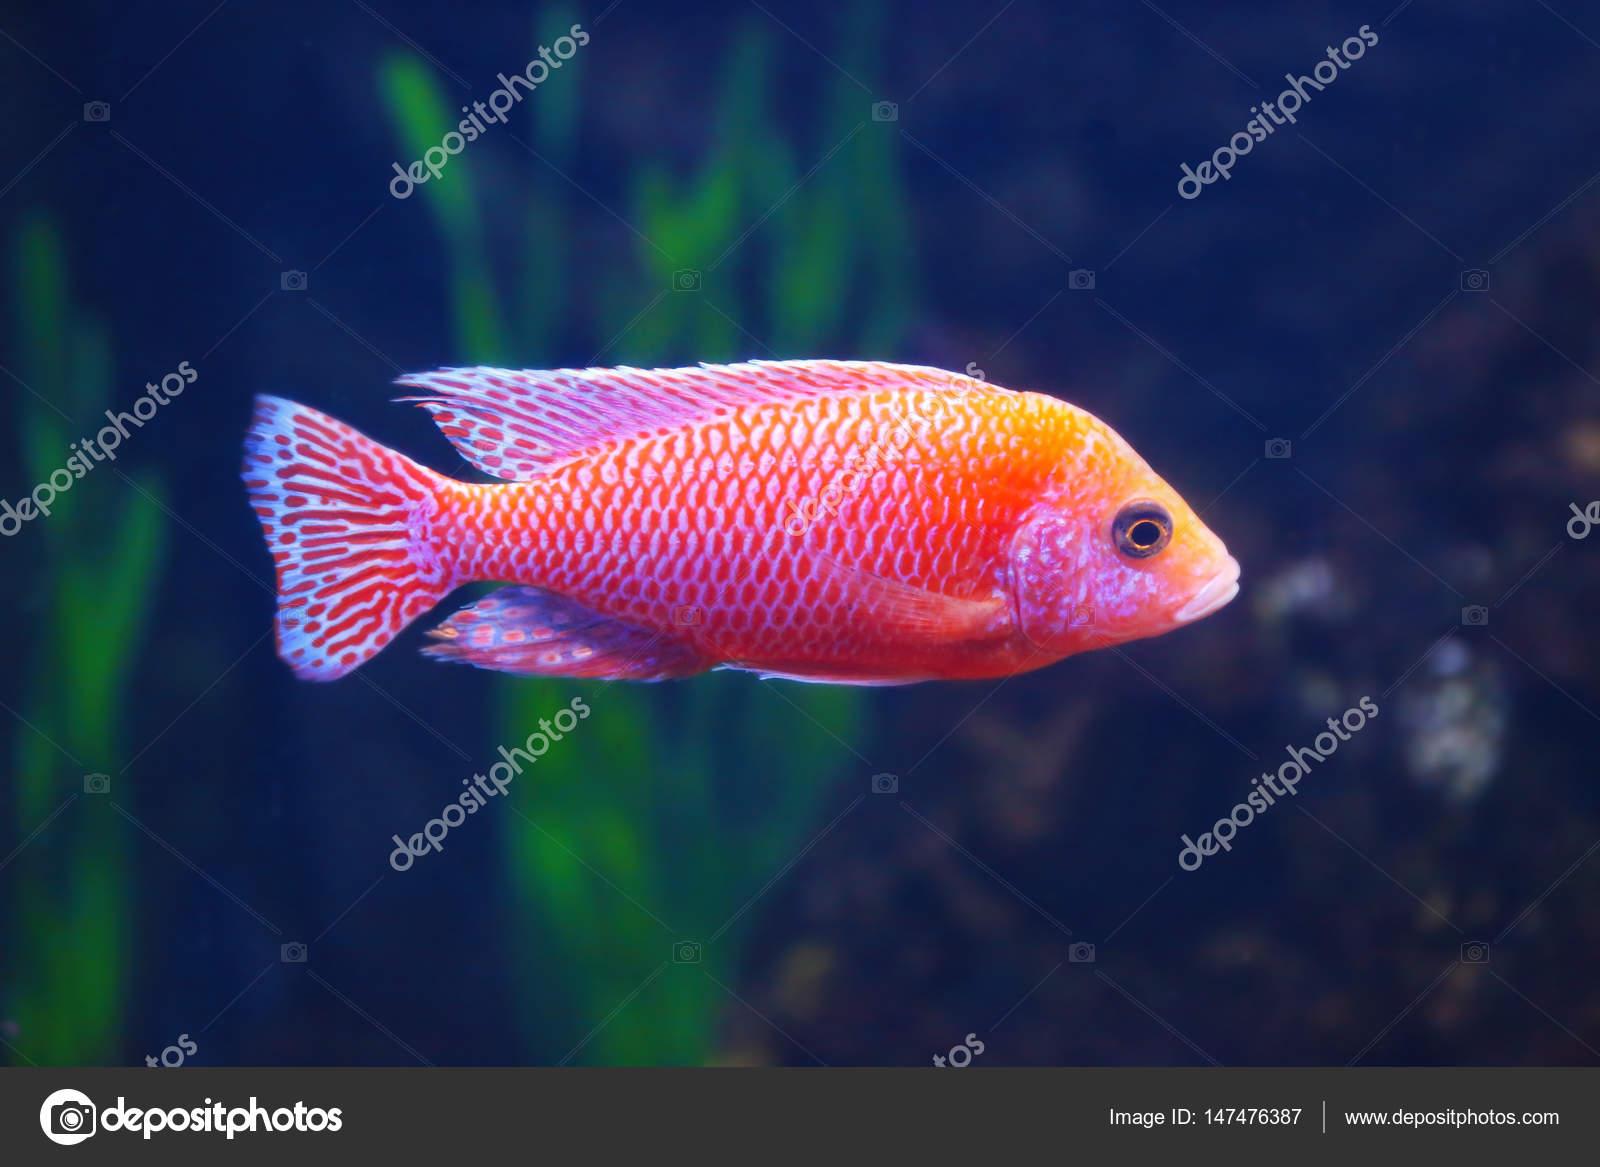 Freshwater aquarium fish exotic - Exotic Freshwater Fish In Aquarium Stock Photo 147476387